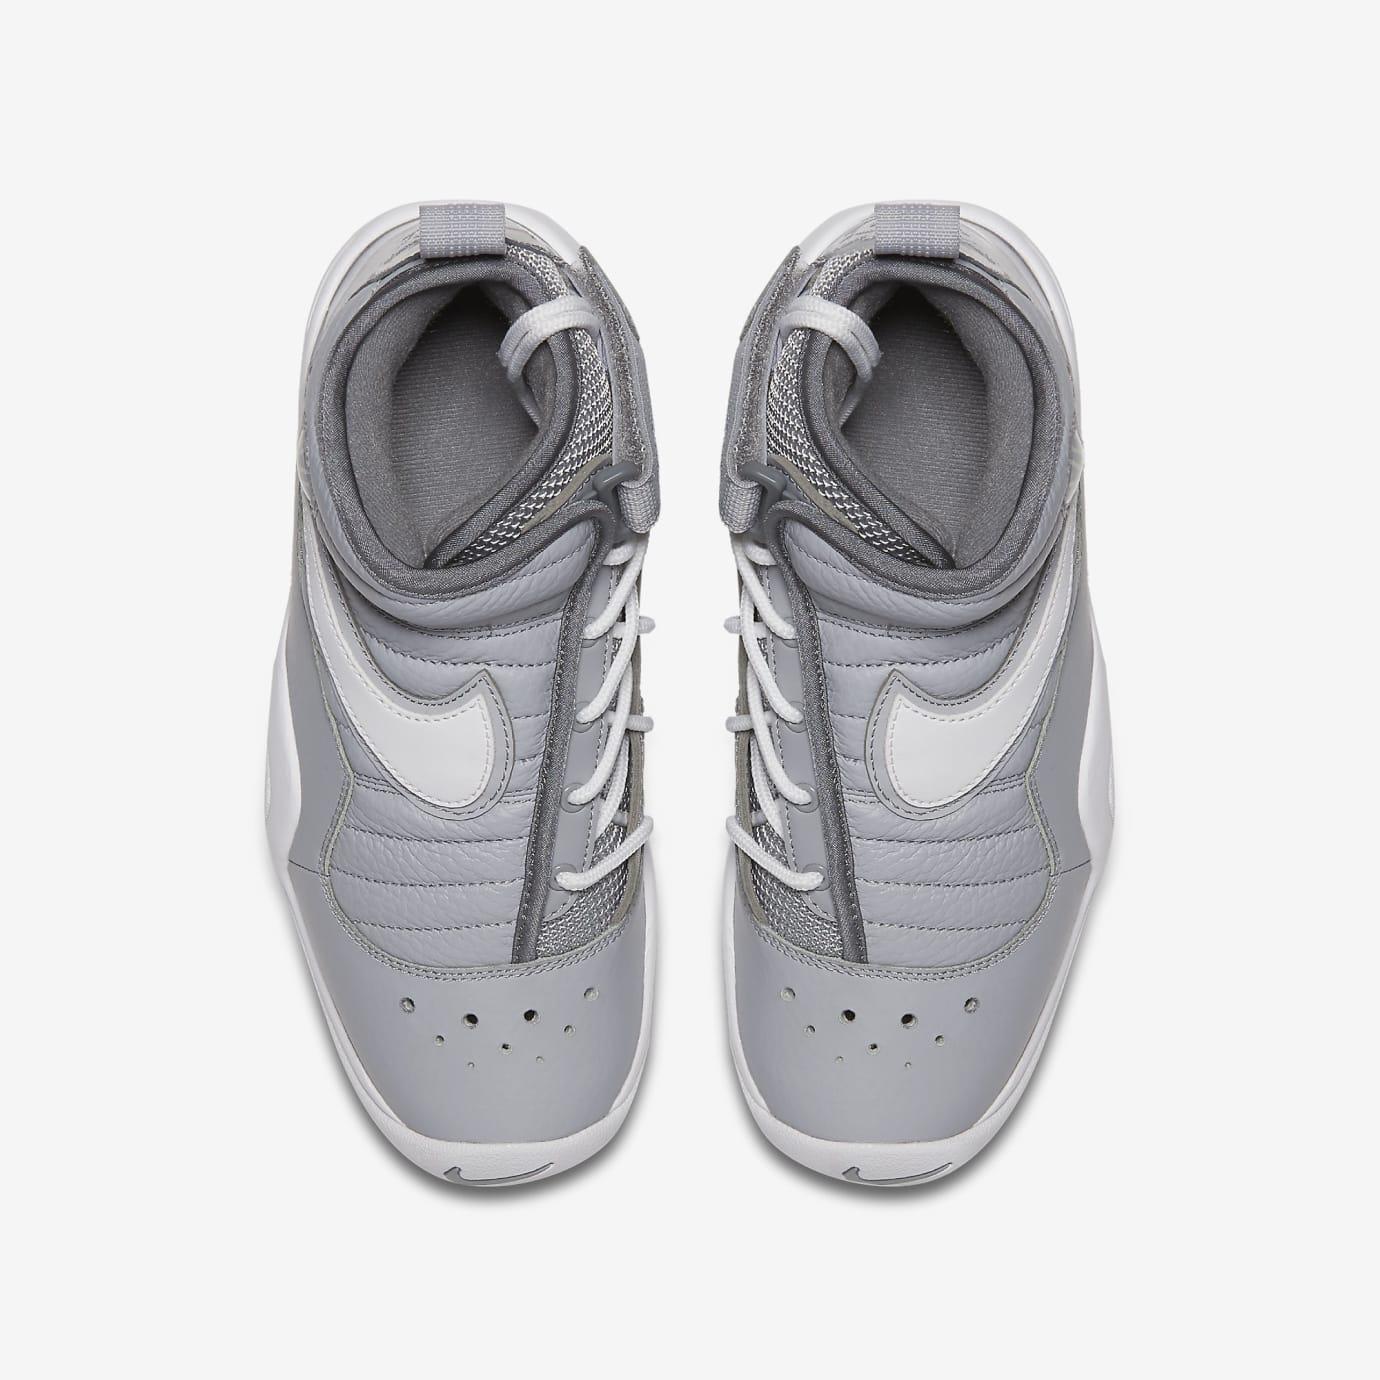 Nike Air Shake Ndestrukt 'Cool Grey' AA2888-002 (Top)